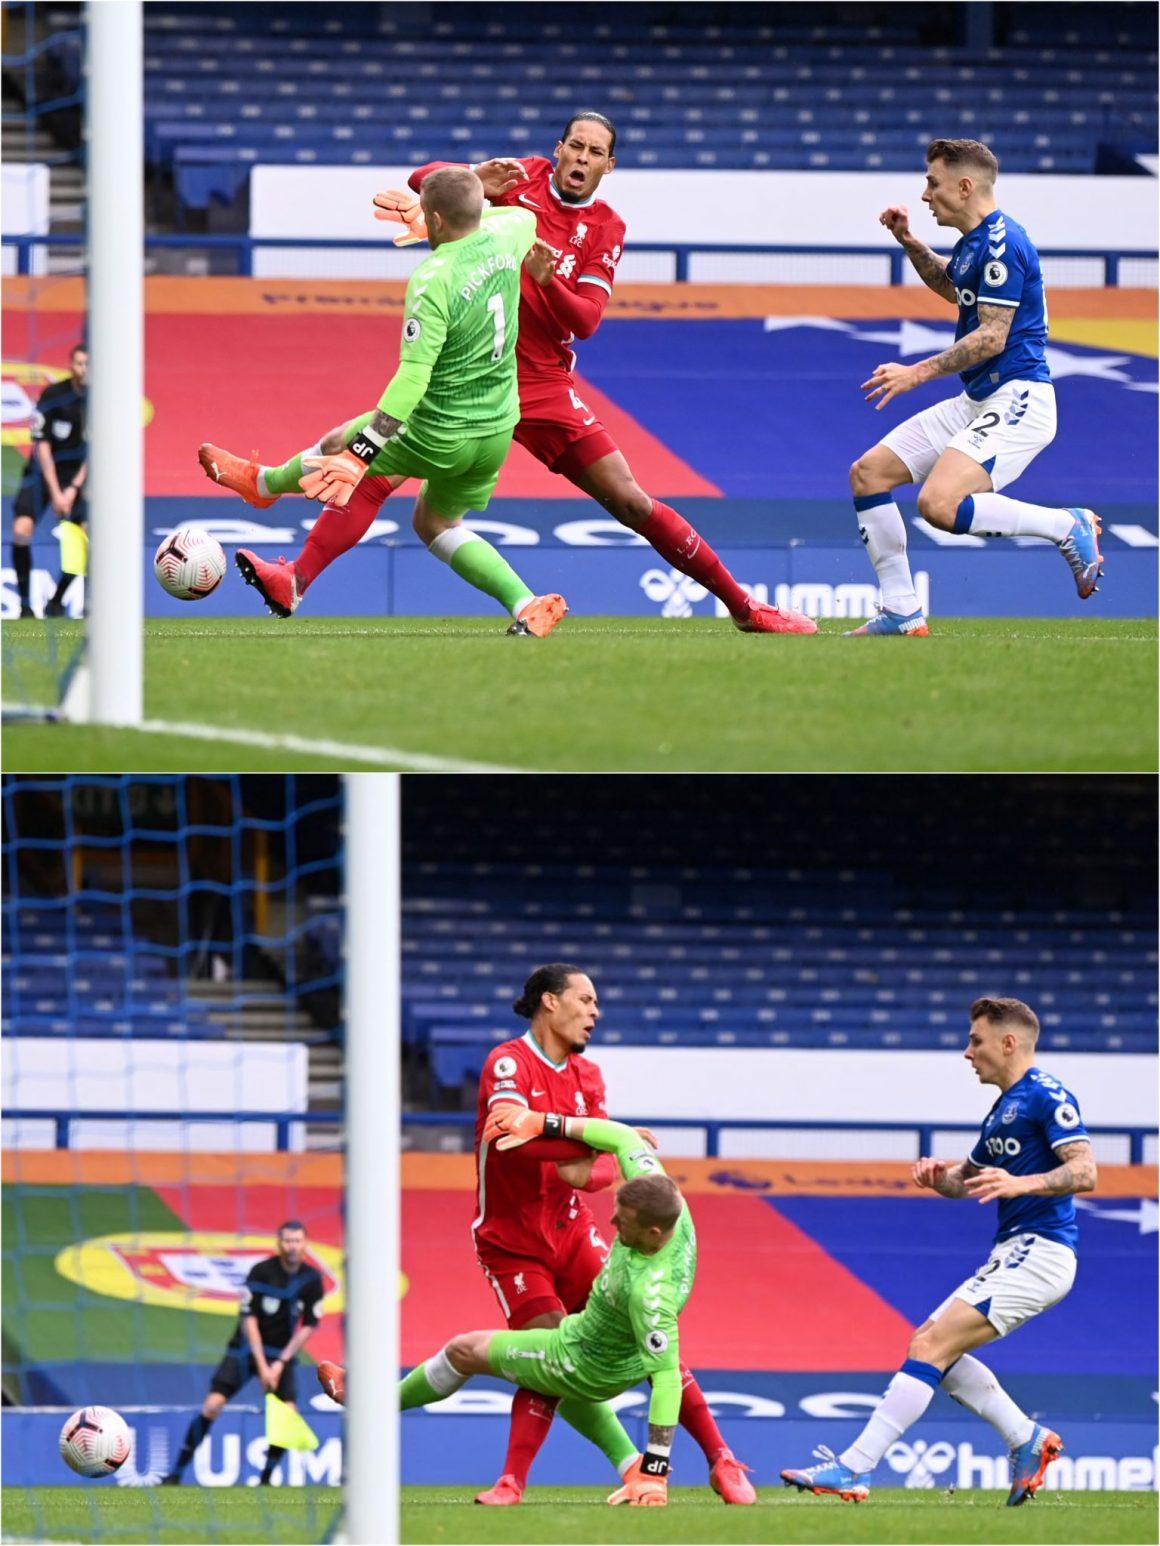 Pickford avoids punishment after injuring van Dijk with shocking challenge  | SportsJOE.ie